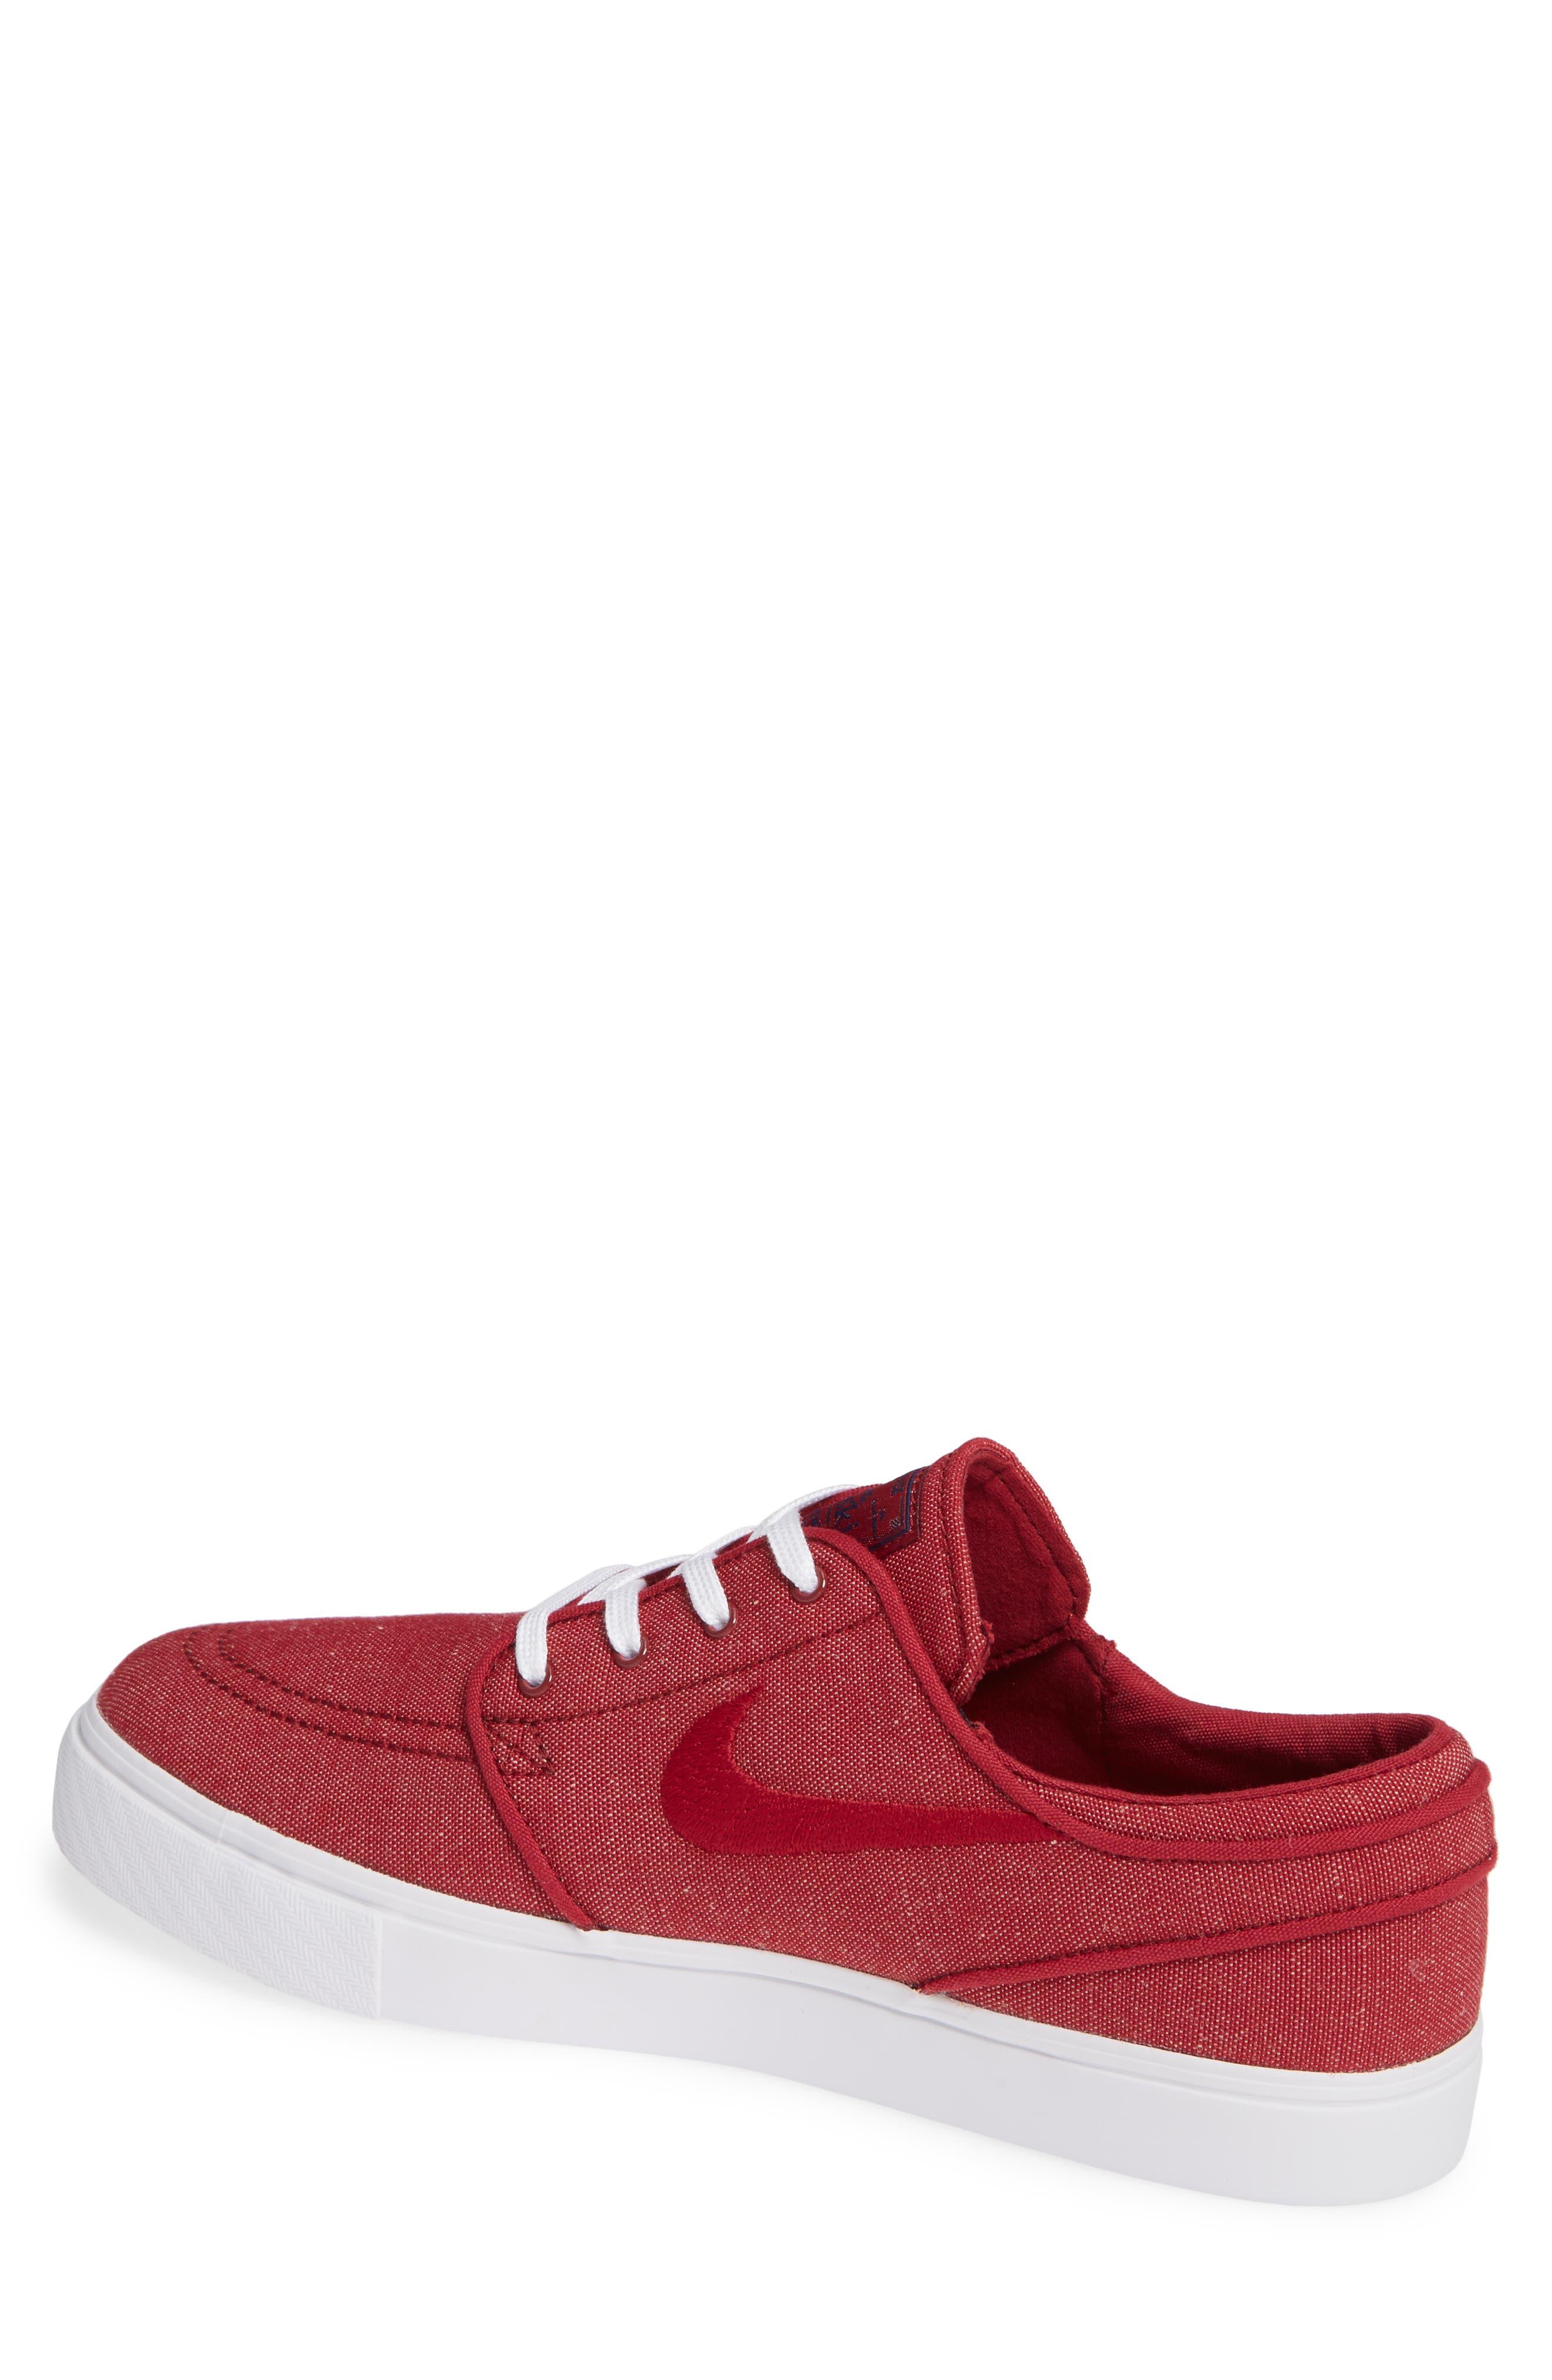 Zoom - Stefan Janoski SB Canvas Skate Shoe,                             Alternate thumbnail 2, color,                             Red Crush/ White